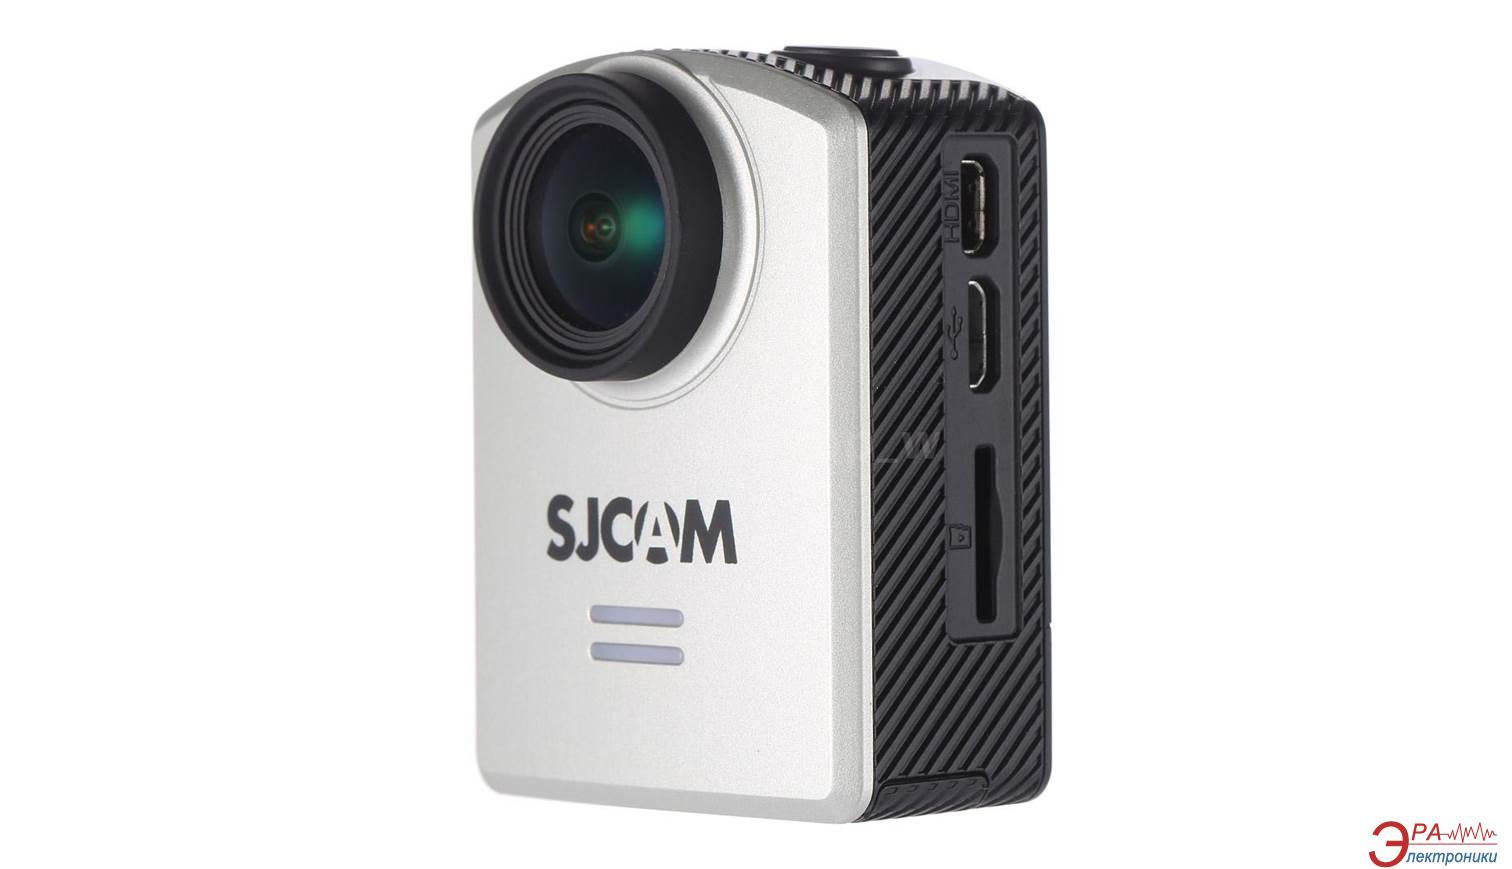 Экшн камера SJCAM M20 4K Silver